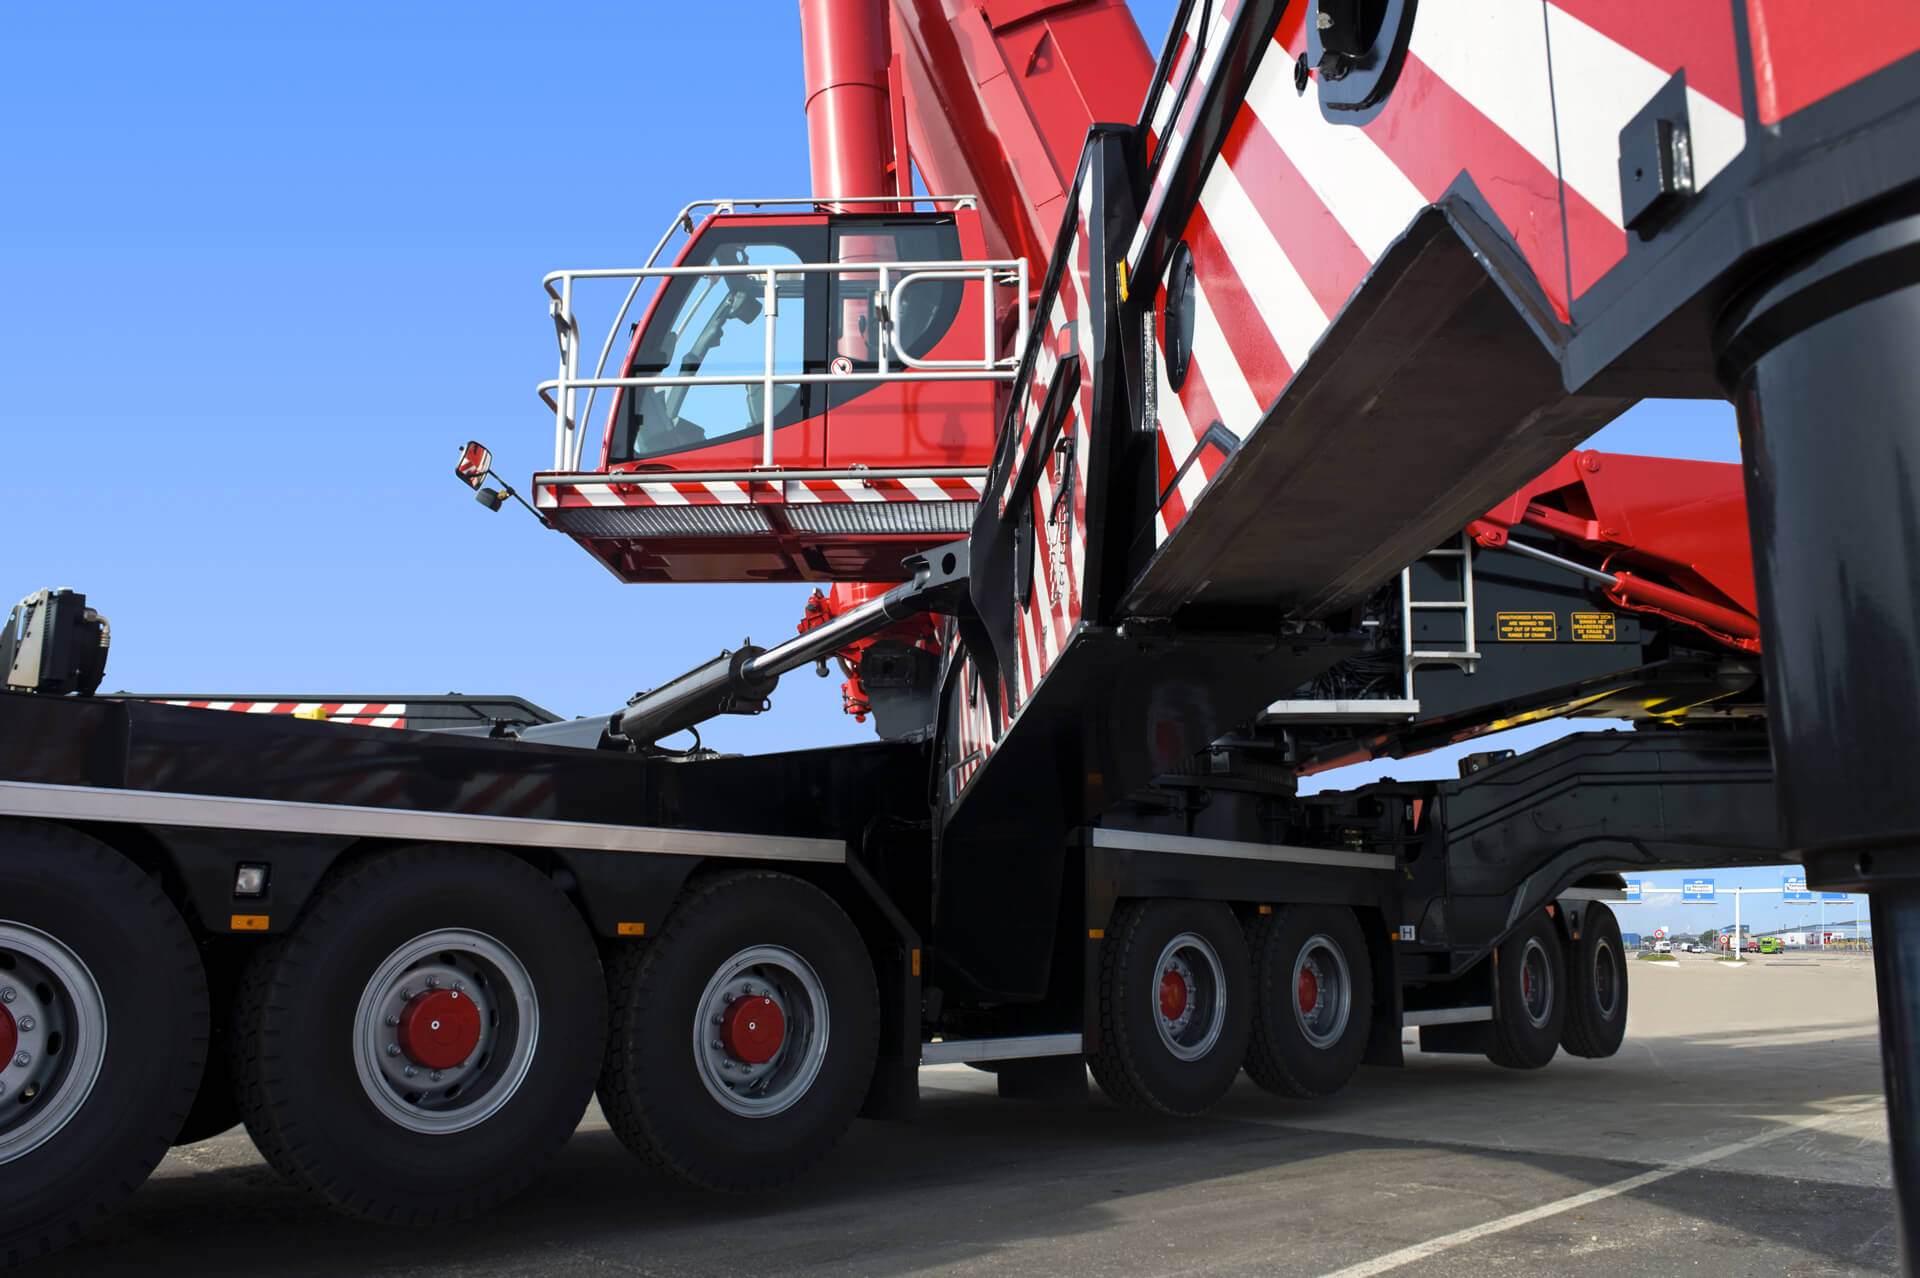 Used Cranes Australia